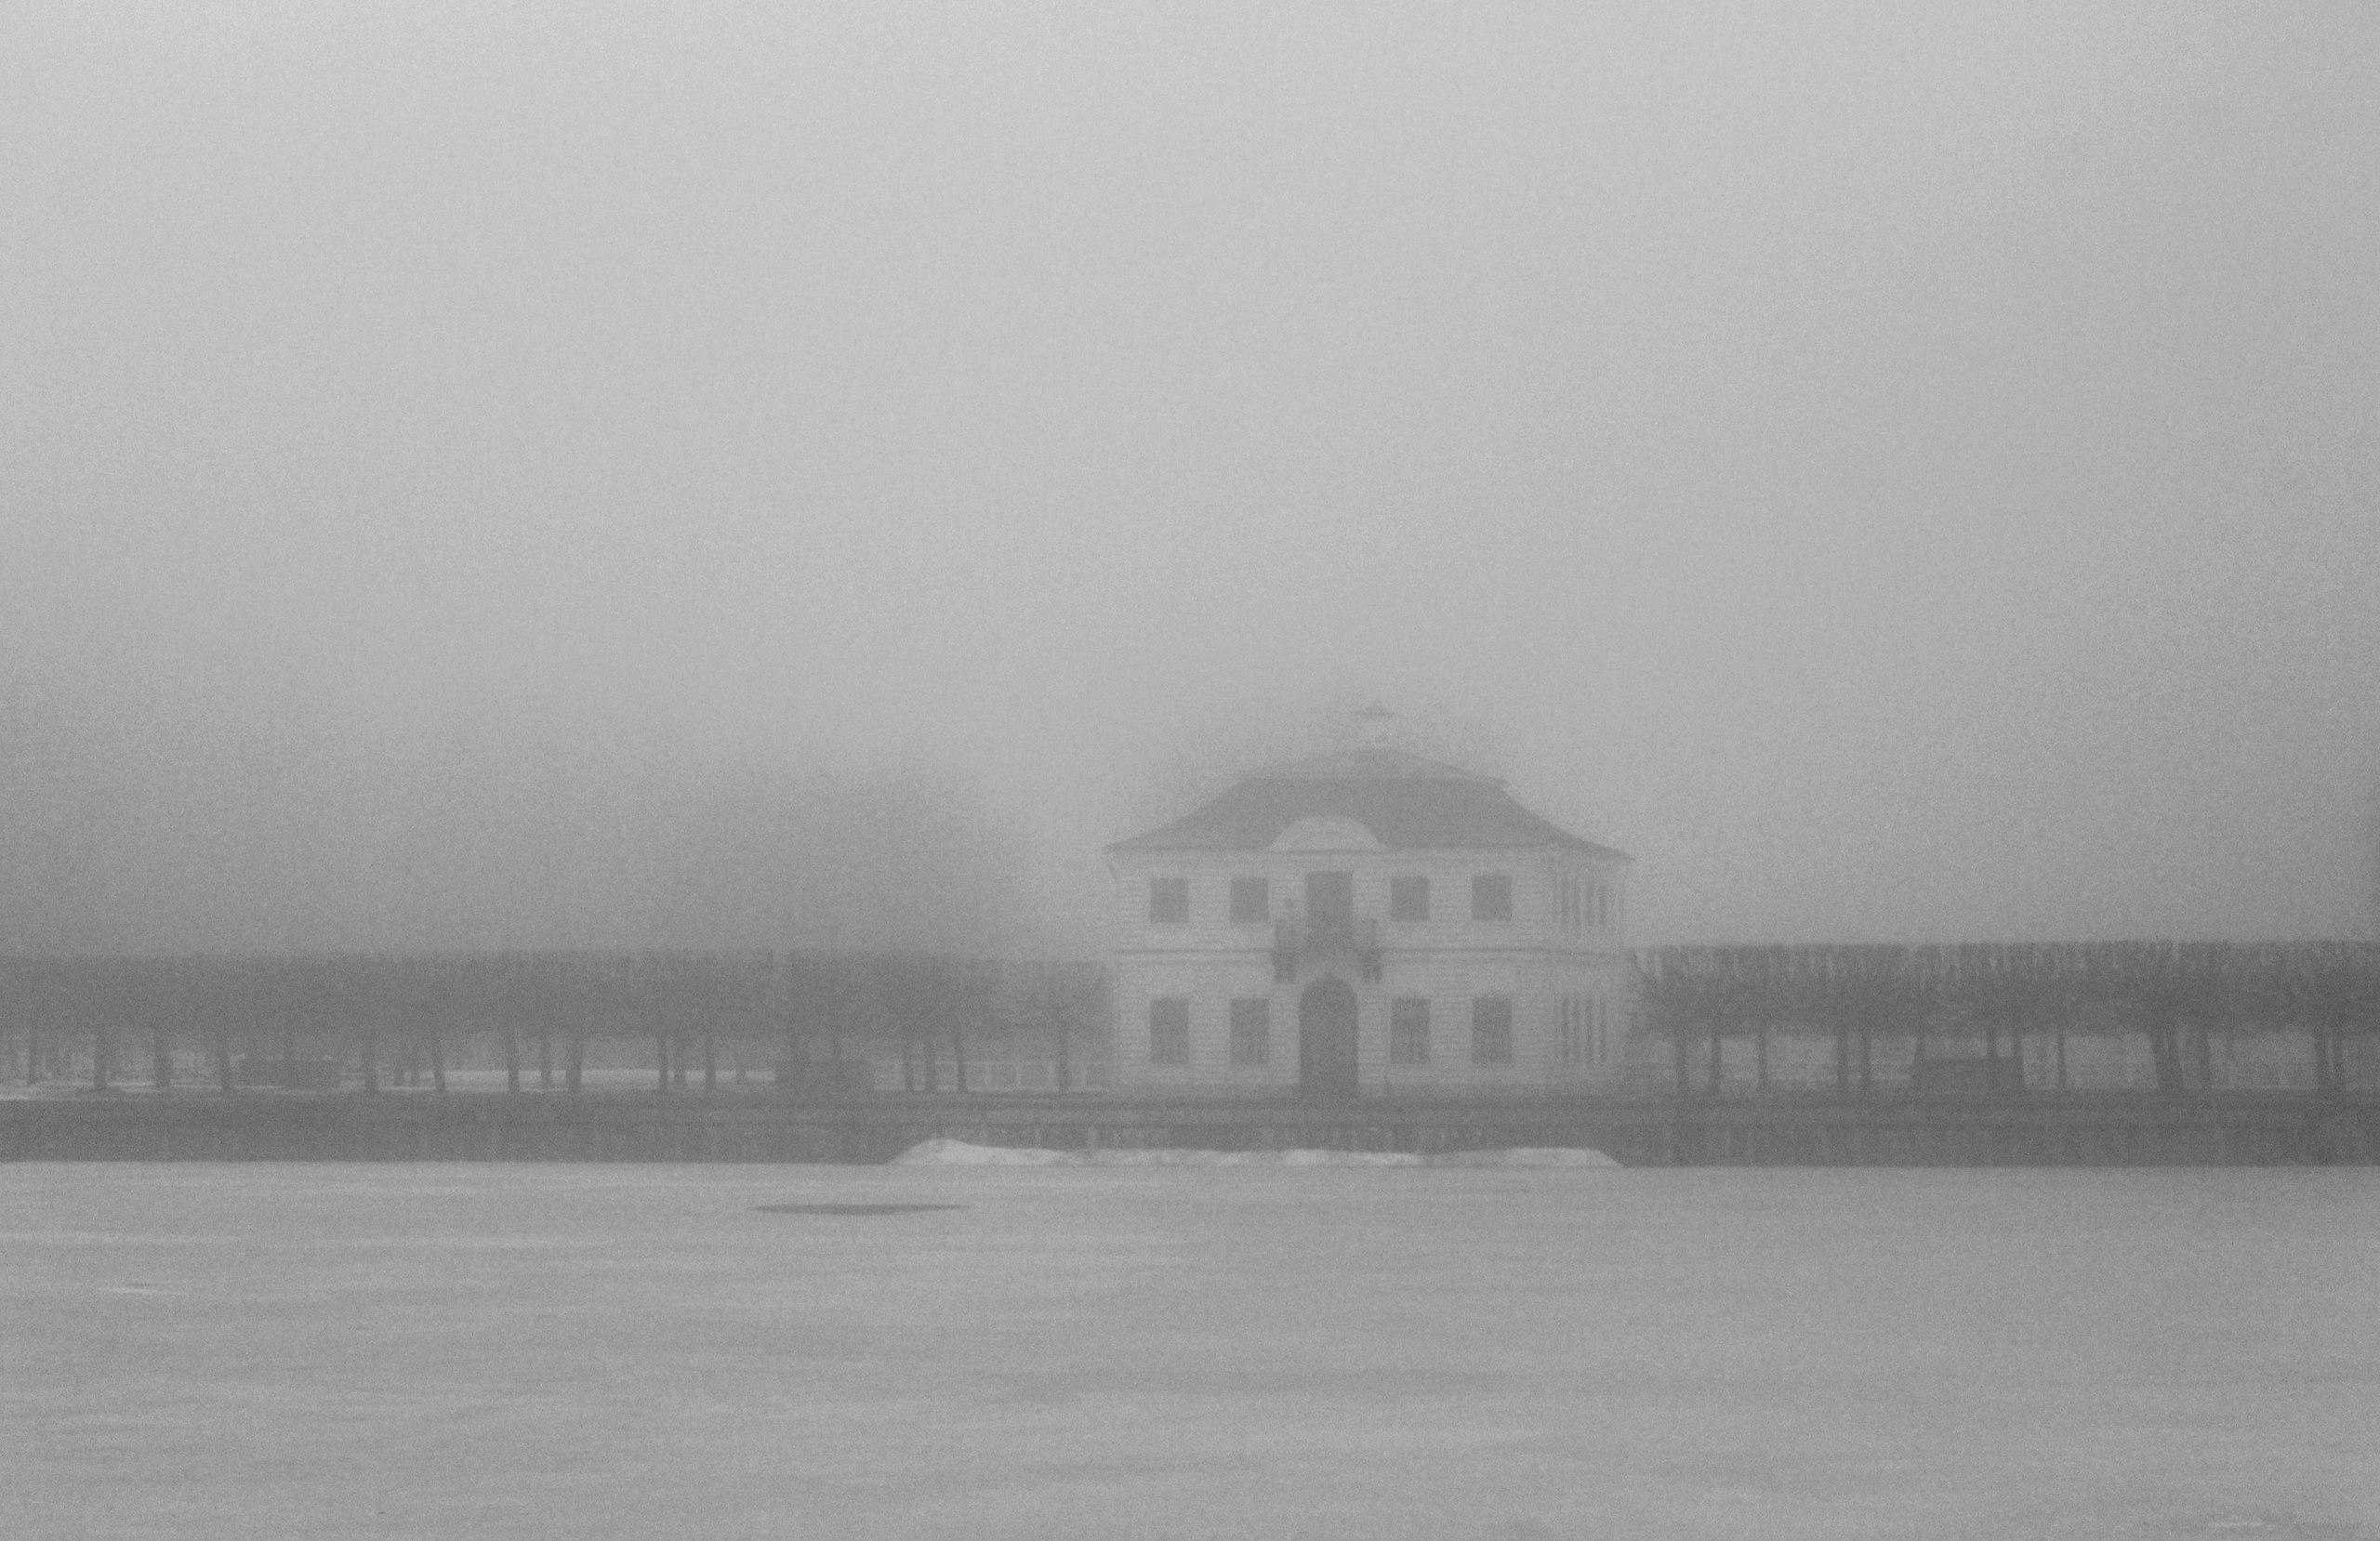 Петергоф, Дворец Марли, туман, сайлентхил